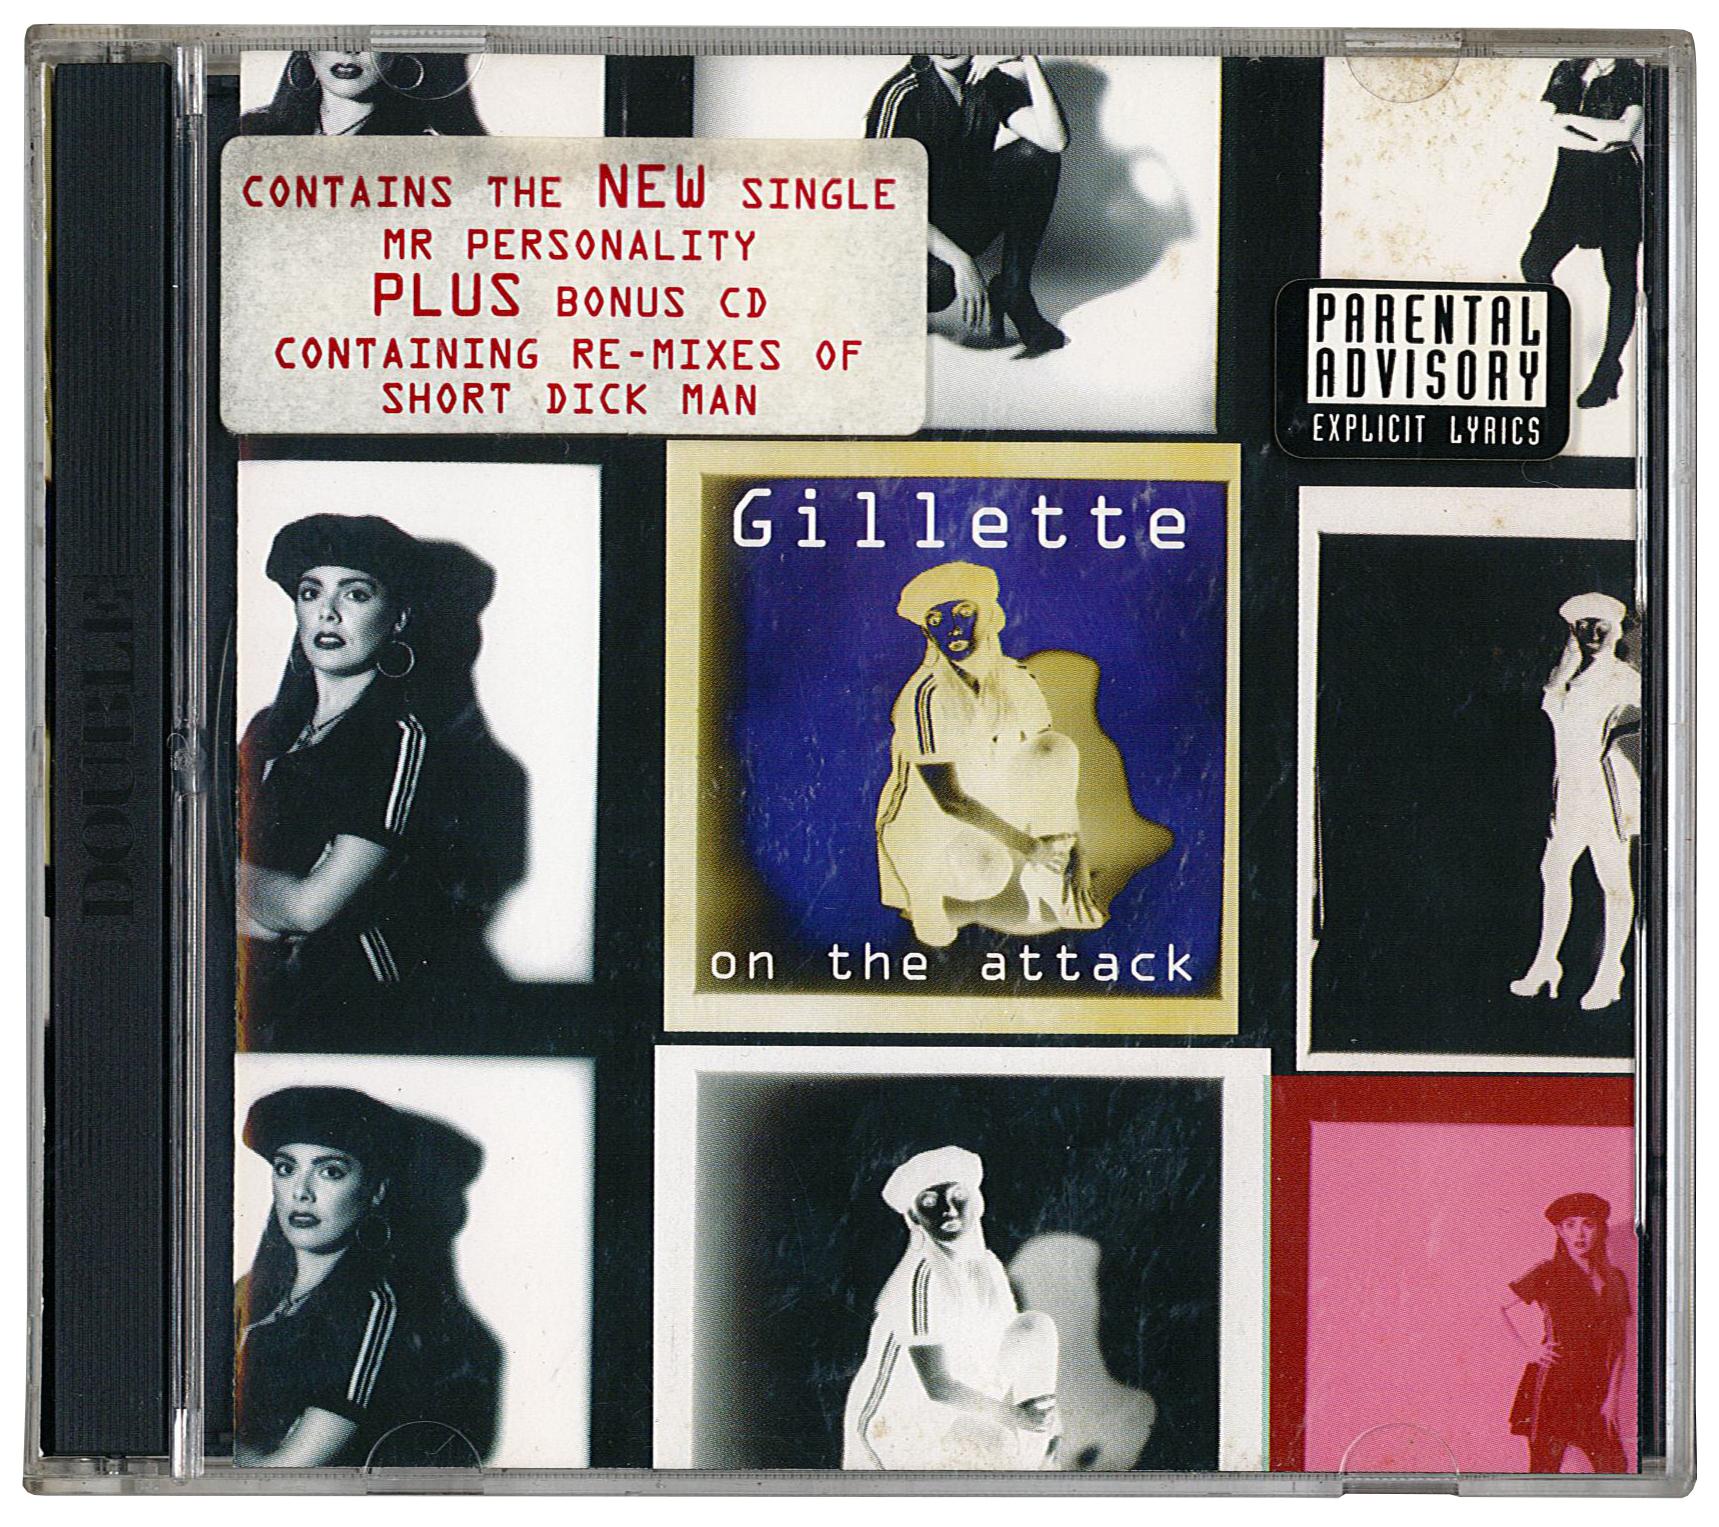 WLWLTDOO-1995-CD-GILLETTE-ATTACK-LIBERATION-FRONT.jpg